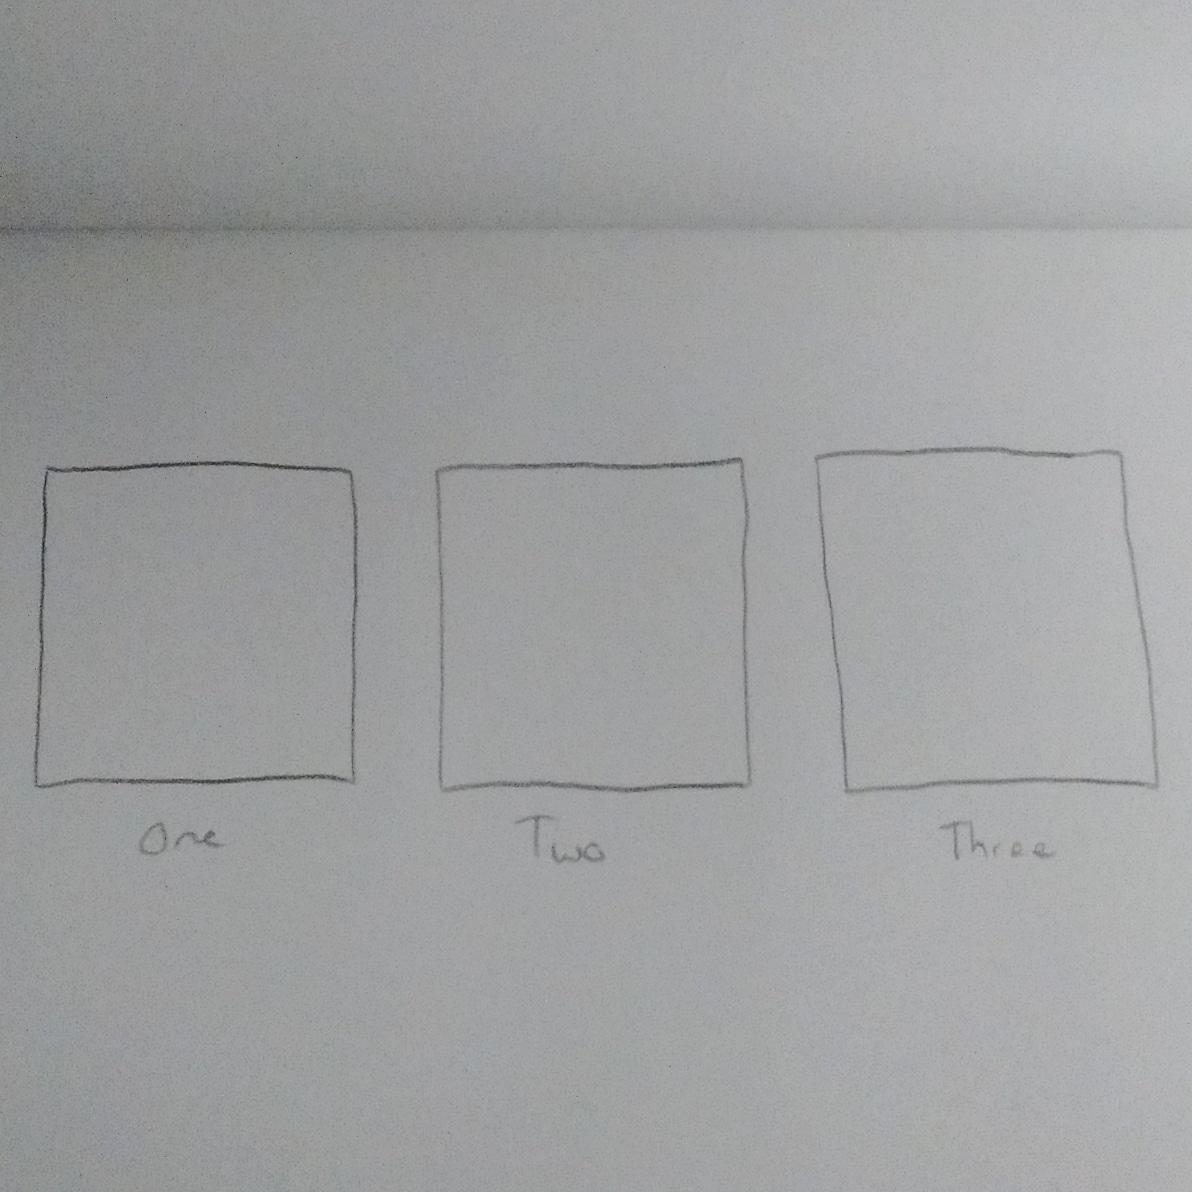 square 1 pun